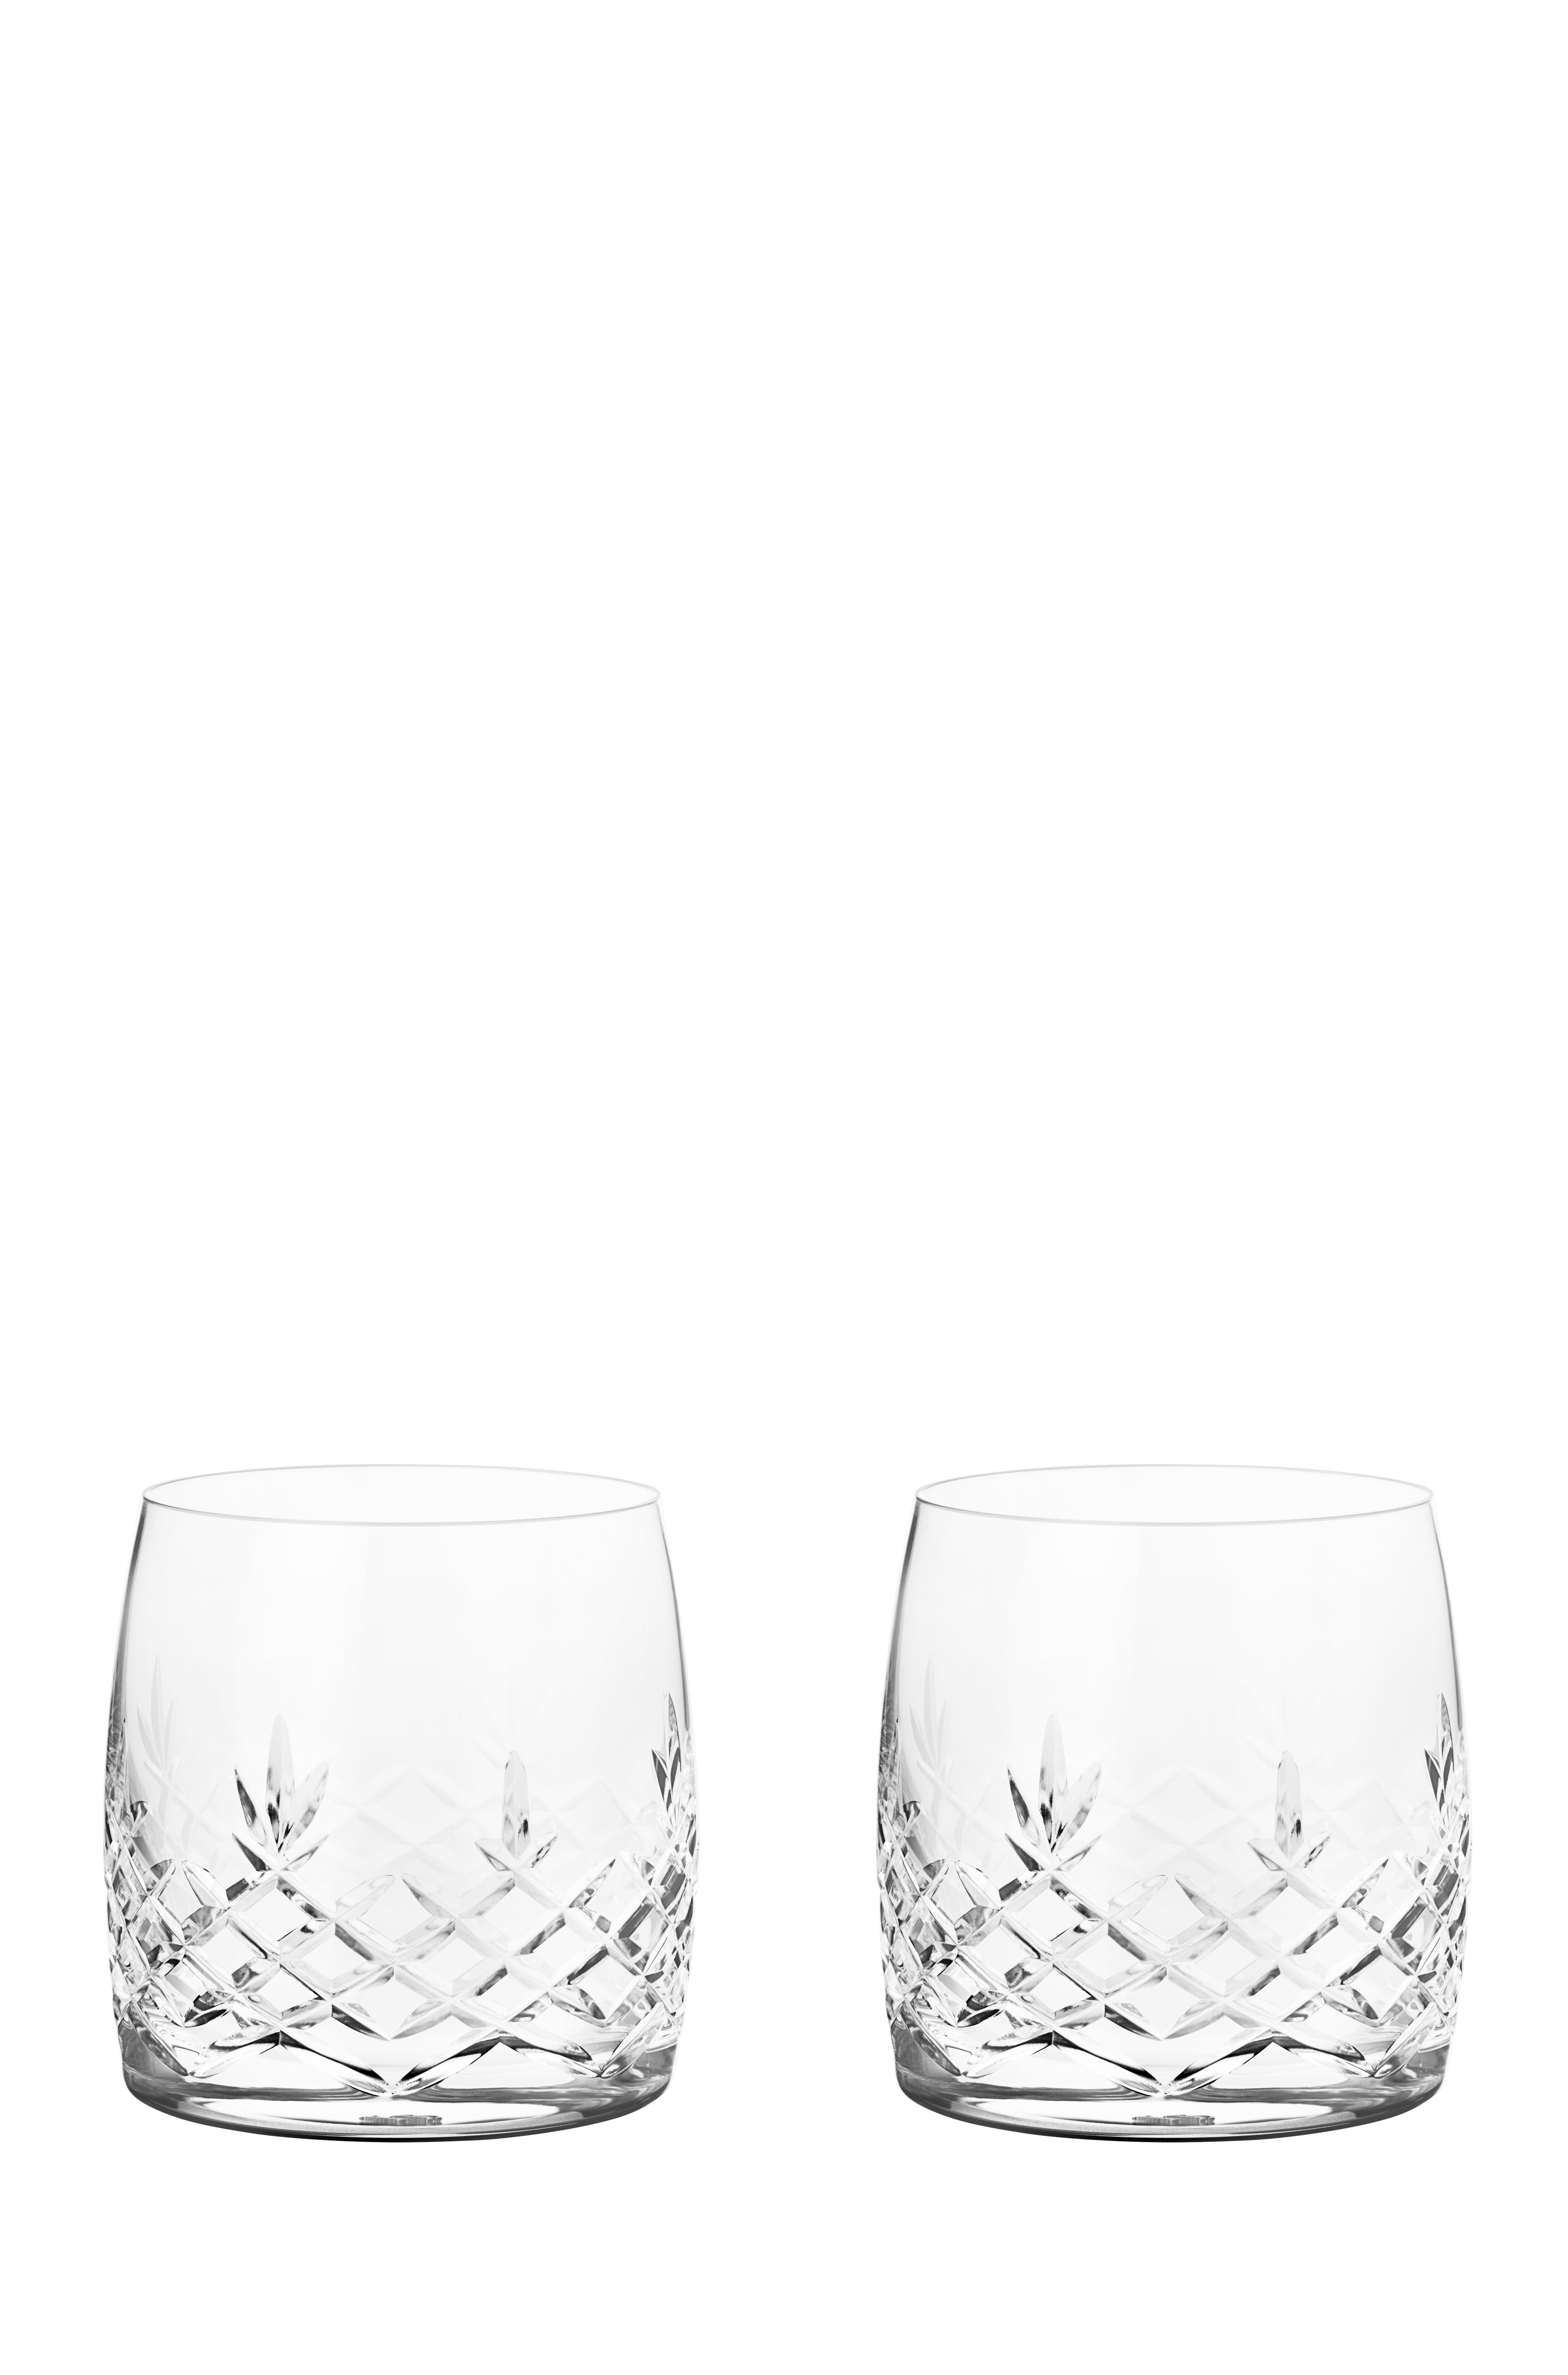 Frederik Bagger Crispy Aqua glas, 23 cl, 2 stk